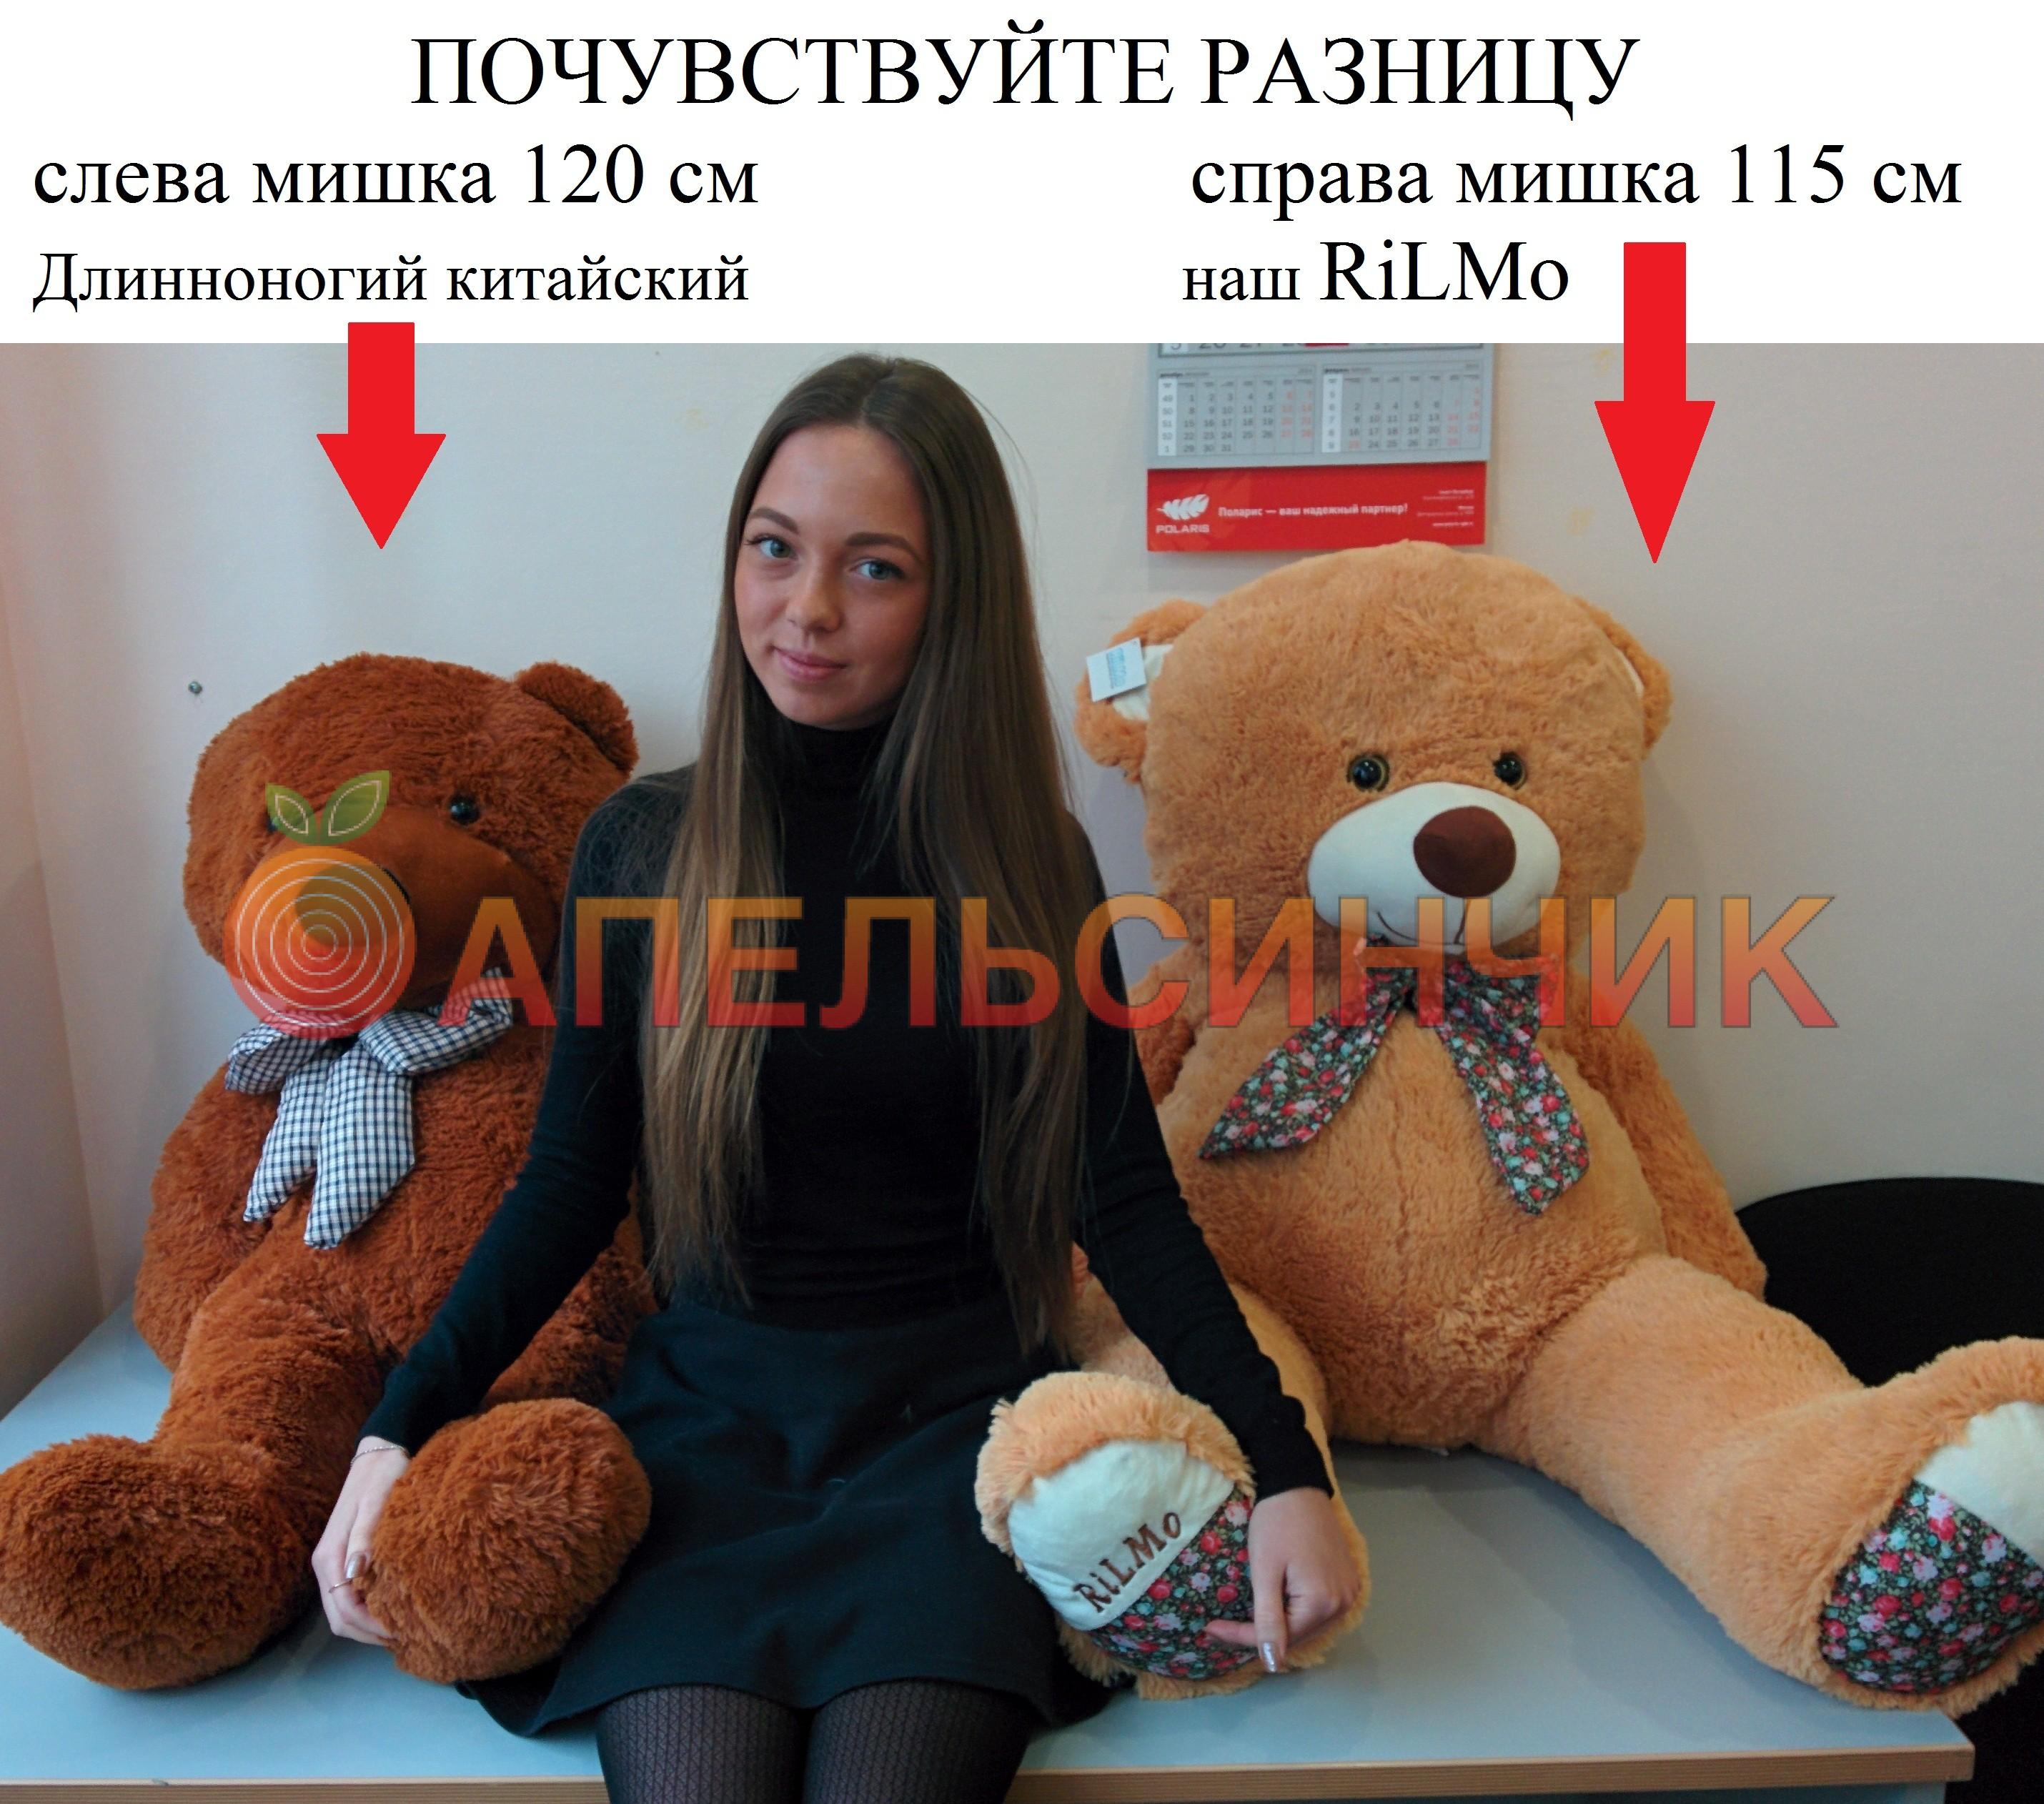 IMG_20150212_144621